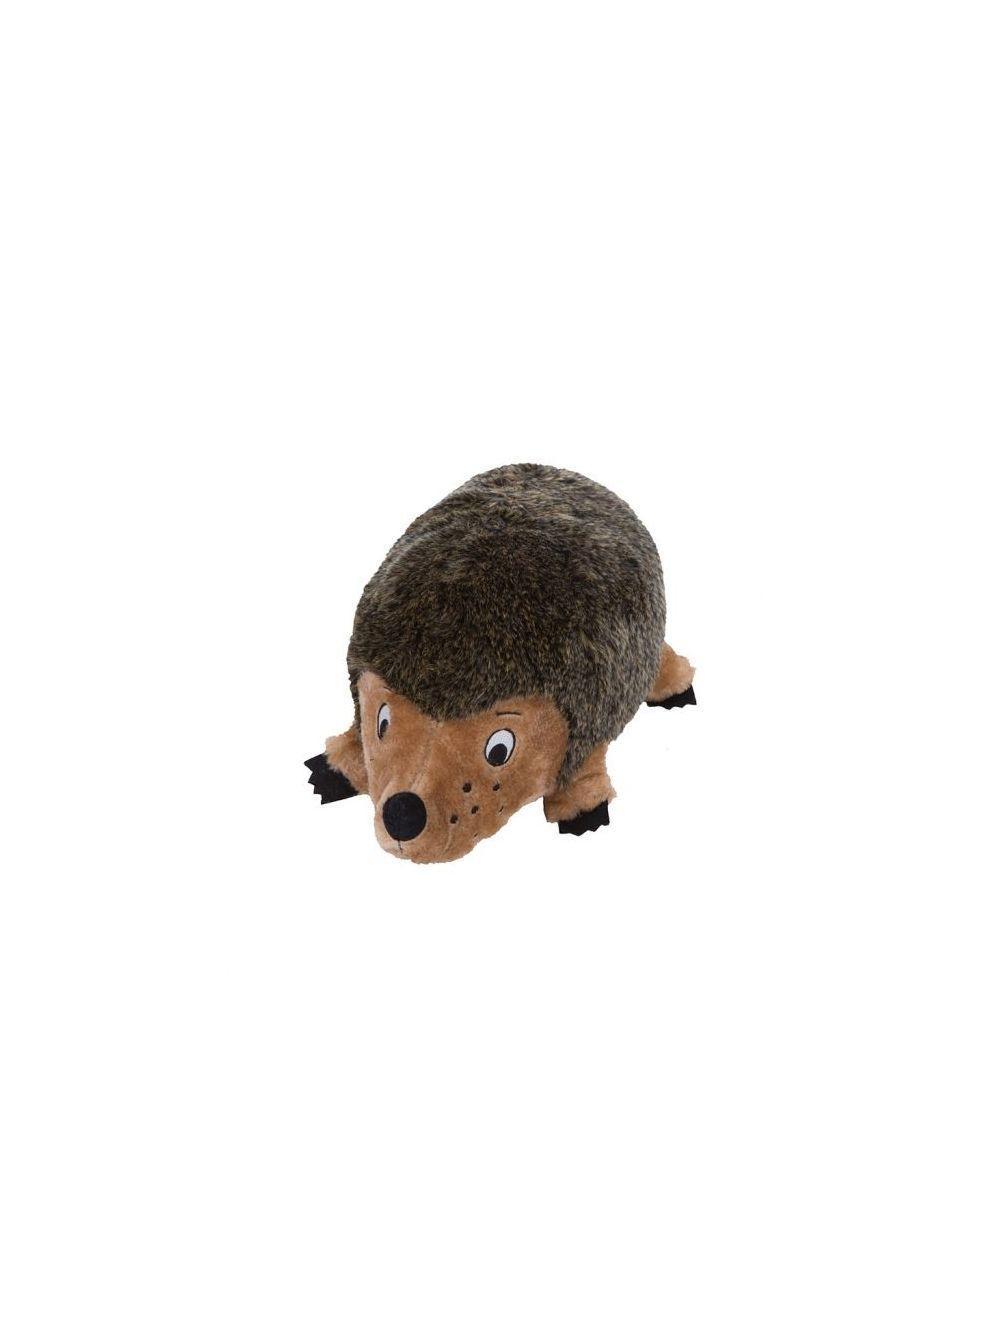 Outward hound peluche puercoespin small - Ciudaddemascotas.com